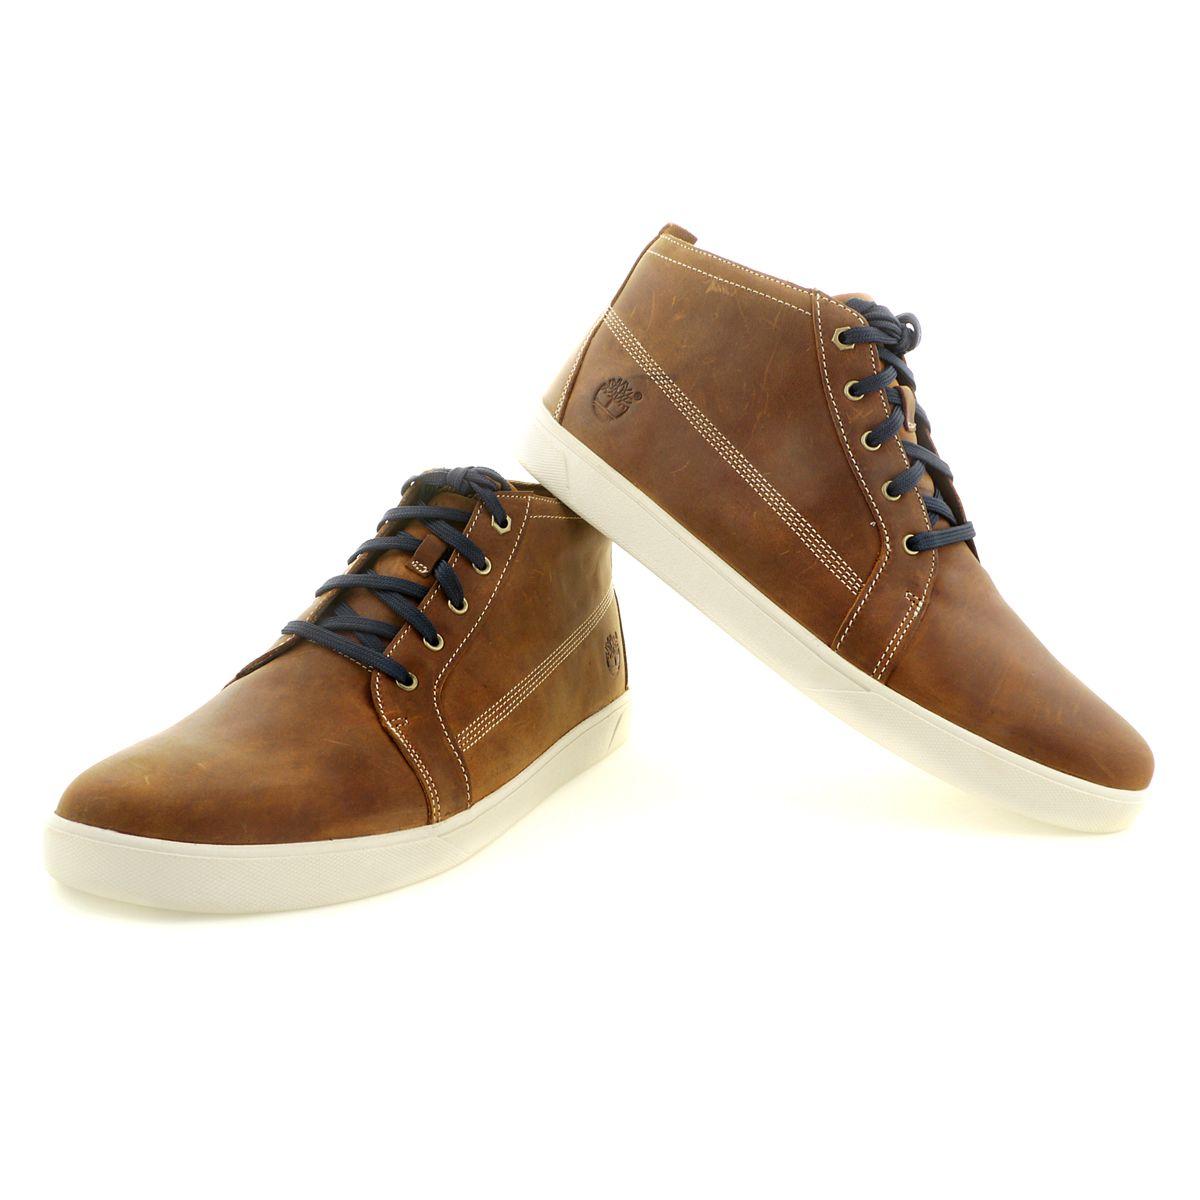 chaussures ek chukka marrons grande taille du 46 au 50. Black Bedroom Furniture Sets. Home Design Ideas